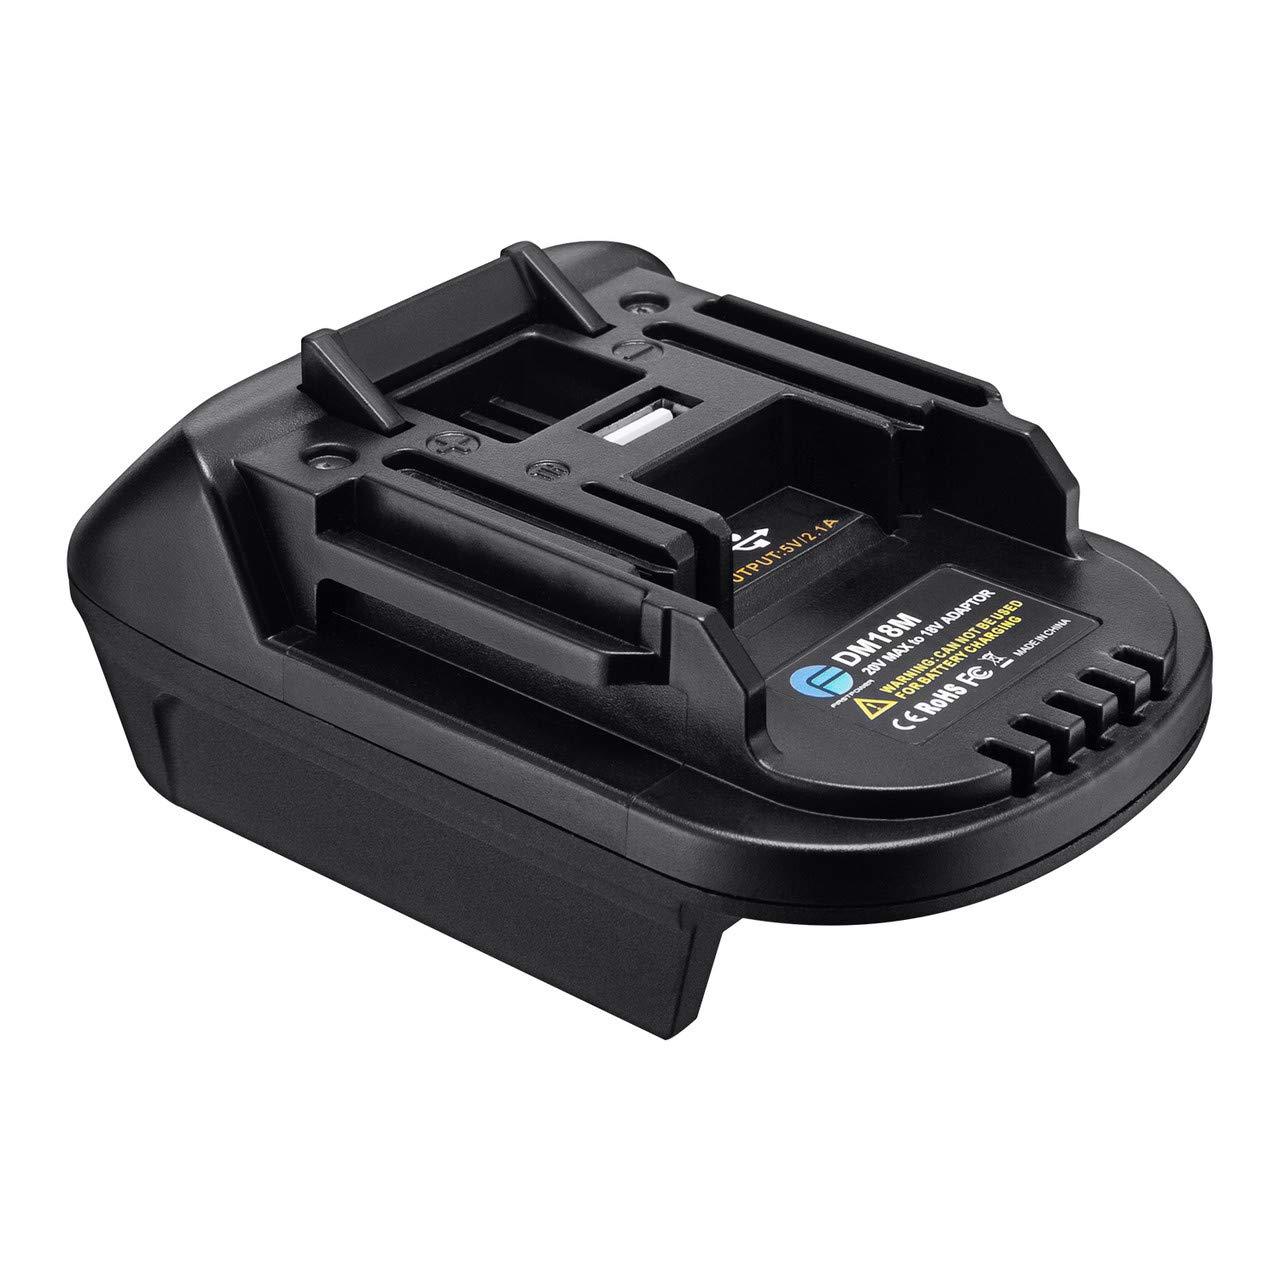 FirstPower DM18M Battery Adapter for 18V Makita Battery, Convert Milwaukee M18 and DeWalt 20V Lithium Battery to Makita 18V Lithium batteries BL1815 BL1850 BL1830 BL1840 with USB port Battery Converte